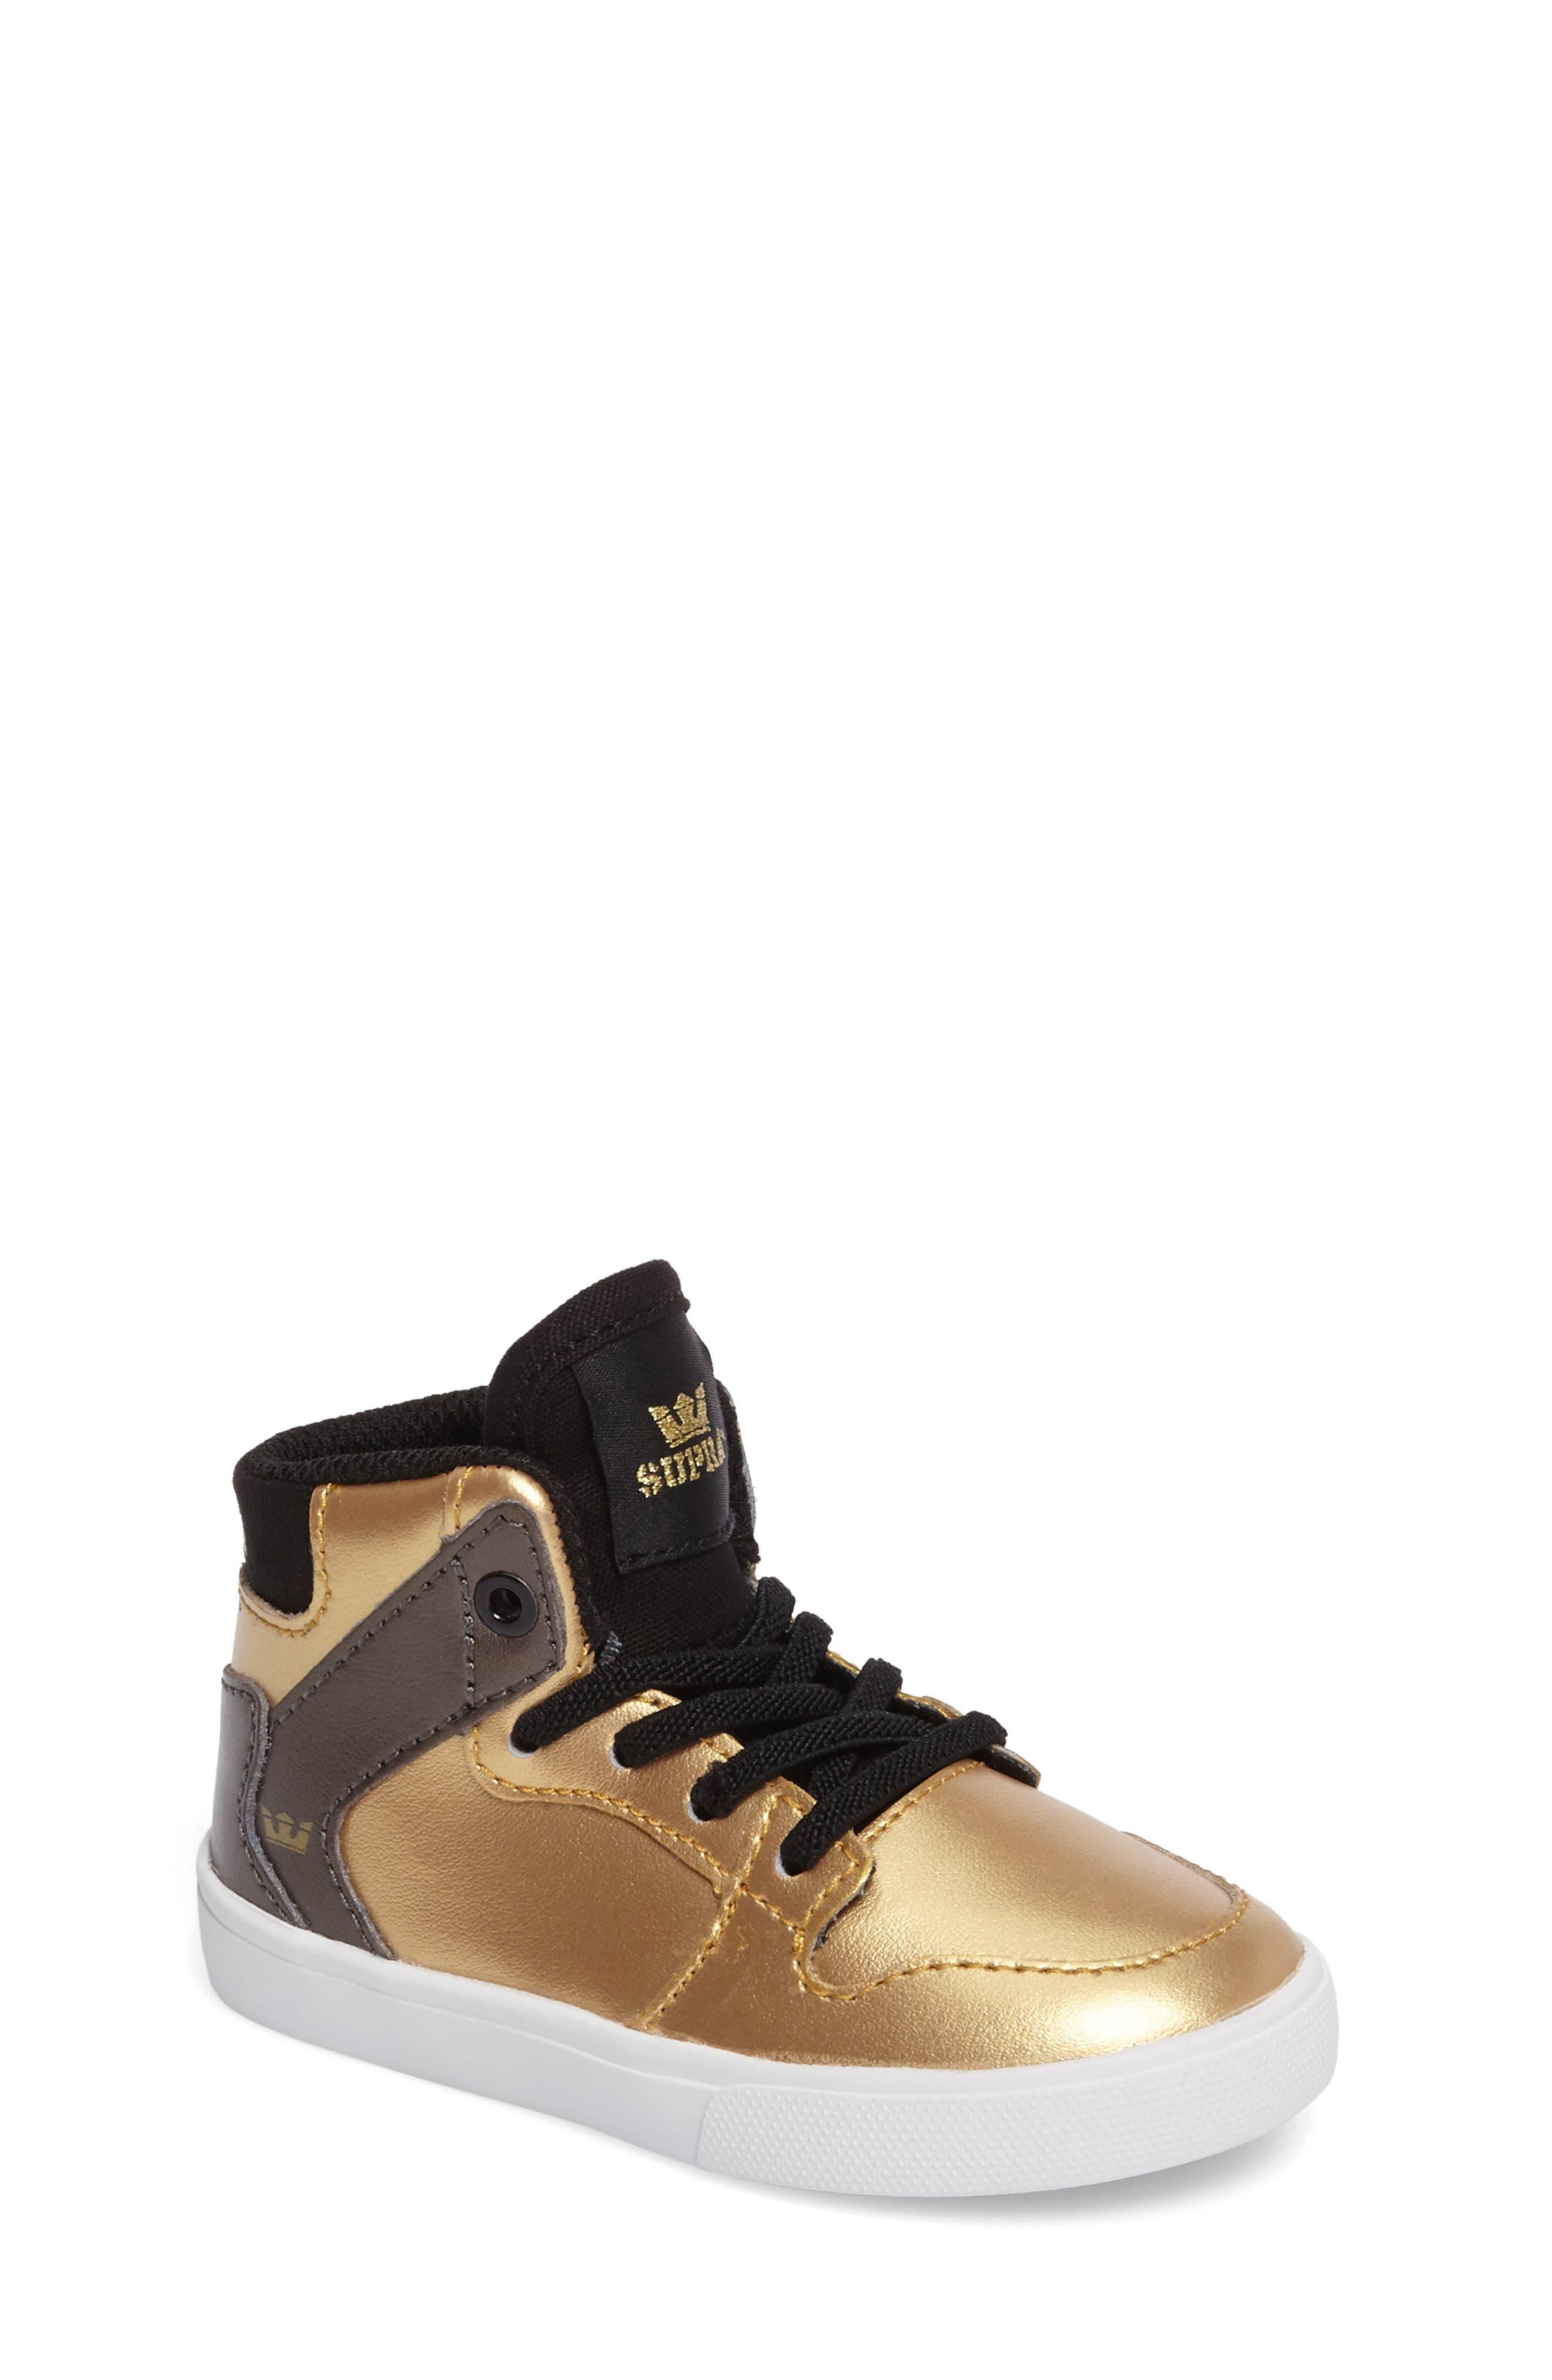 Vaider High Top Sneaker,                             Main thumbnail 1, color,                             Gold